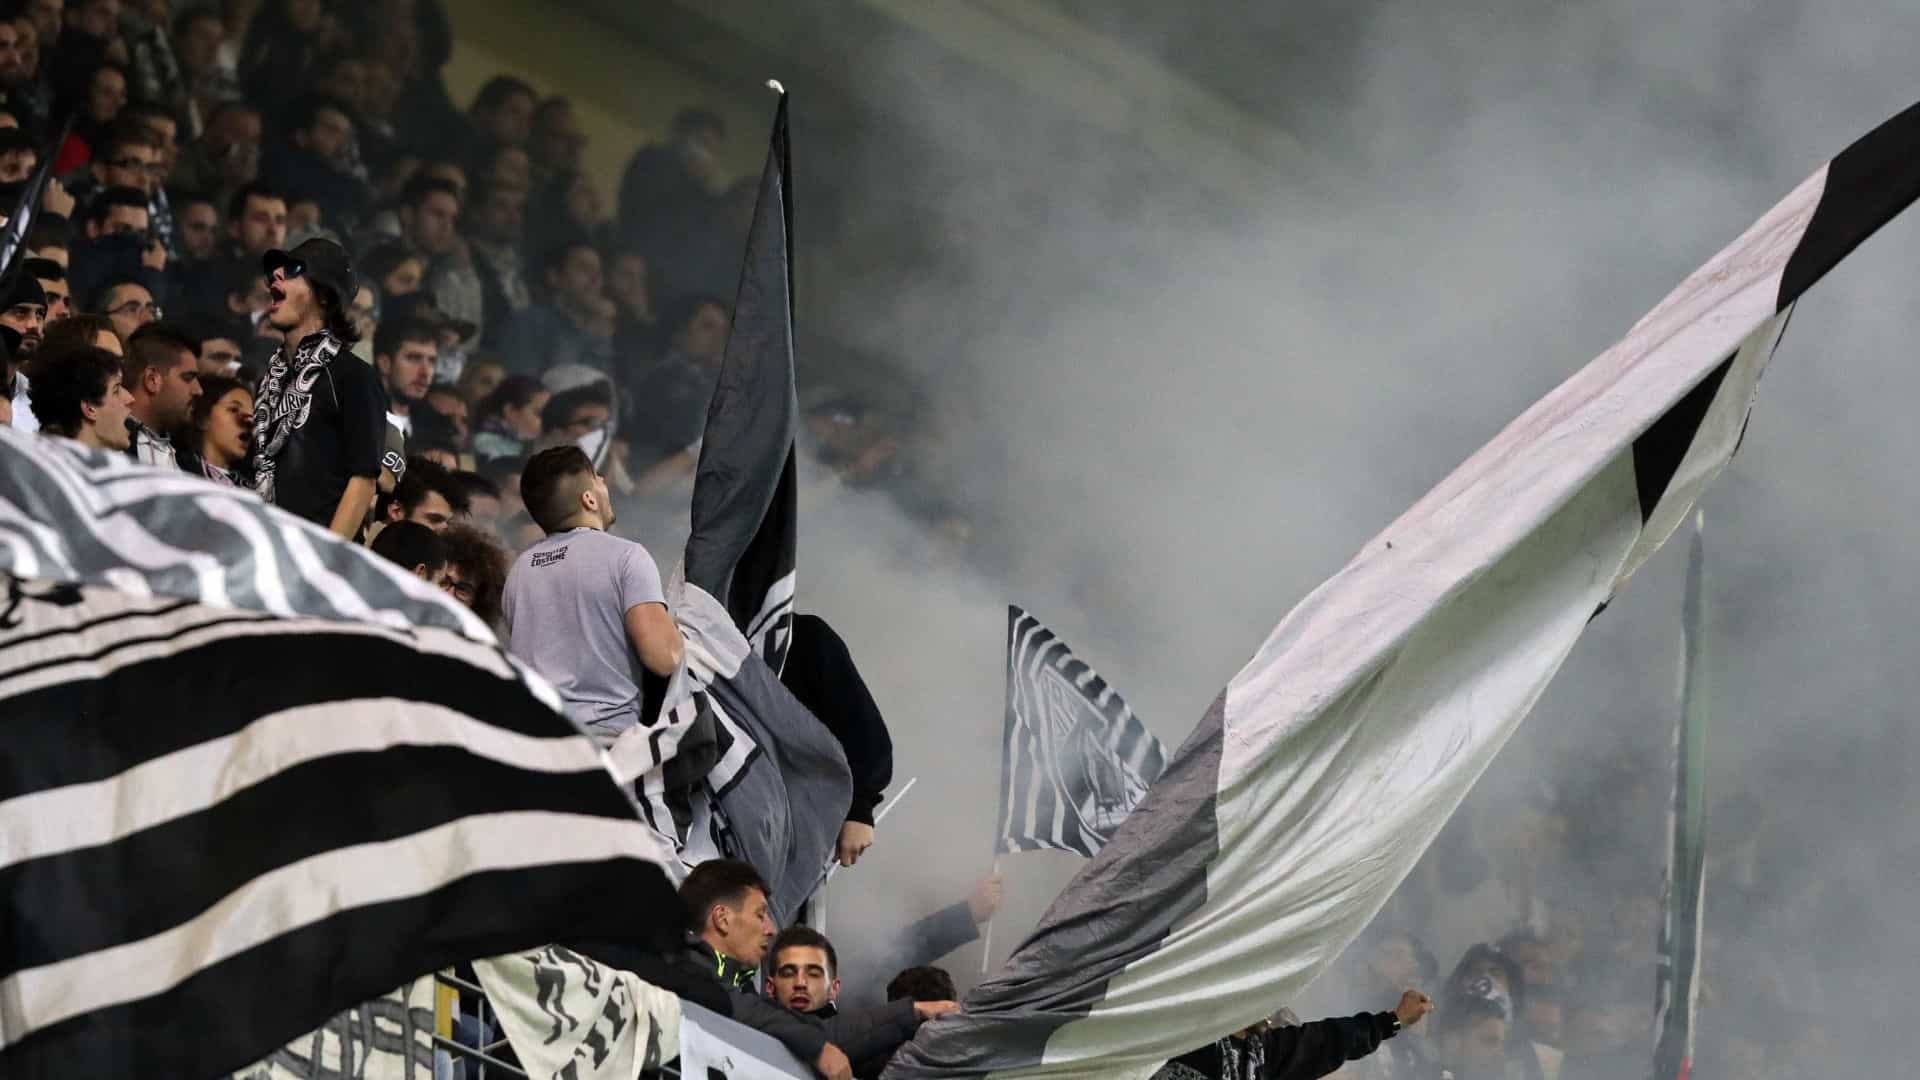 Chapecoense: Vit. de Guimarães lamenta morte de ex-atleta Caio Júnior